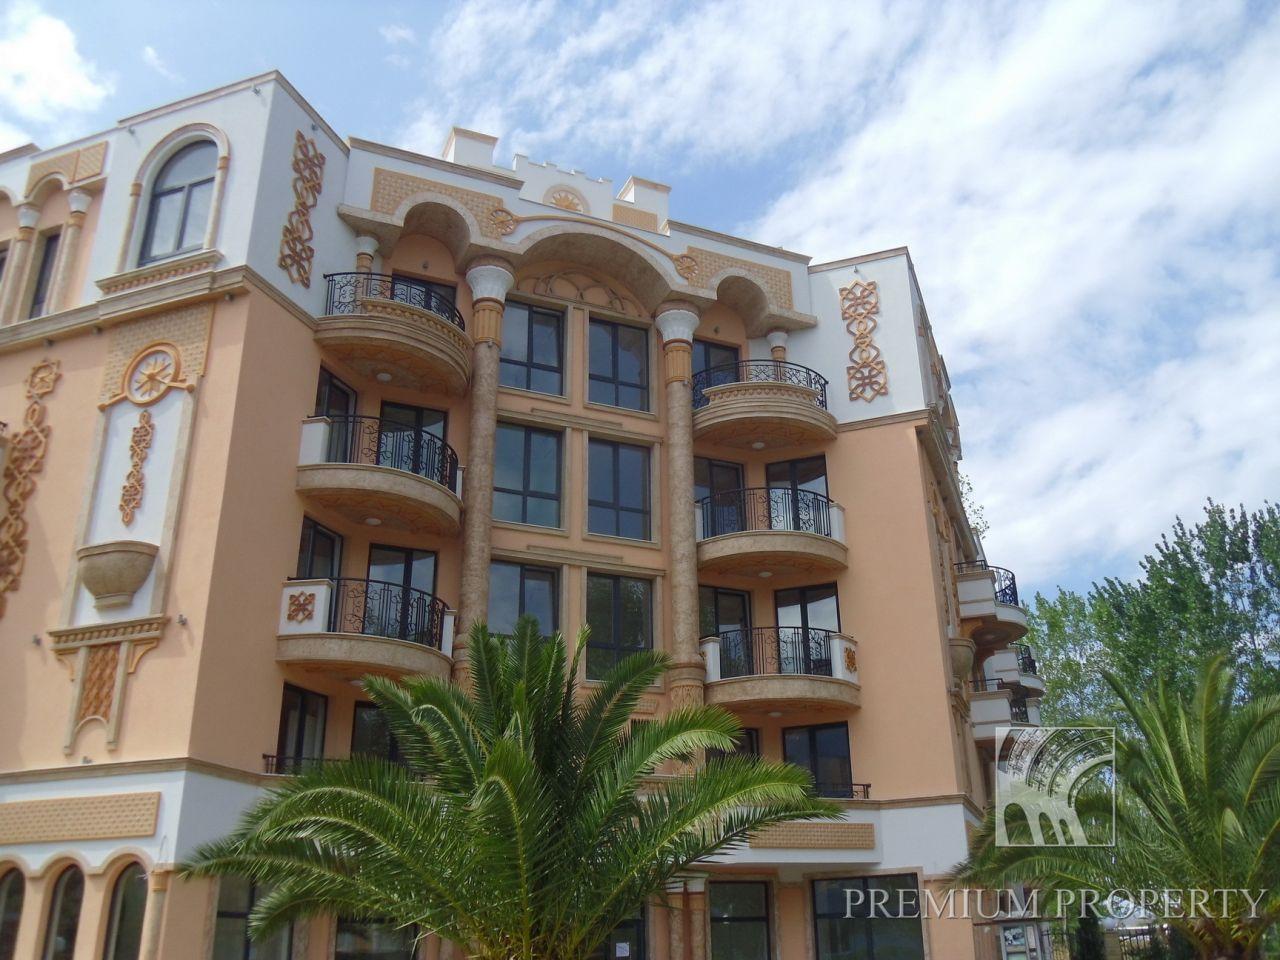 Апартаменты на Солнечном берегу, Болгария, 86.39 м2 - фото 1